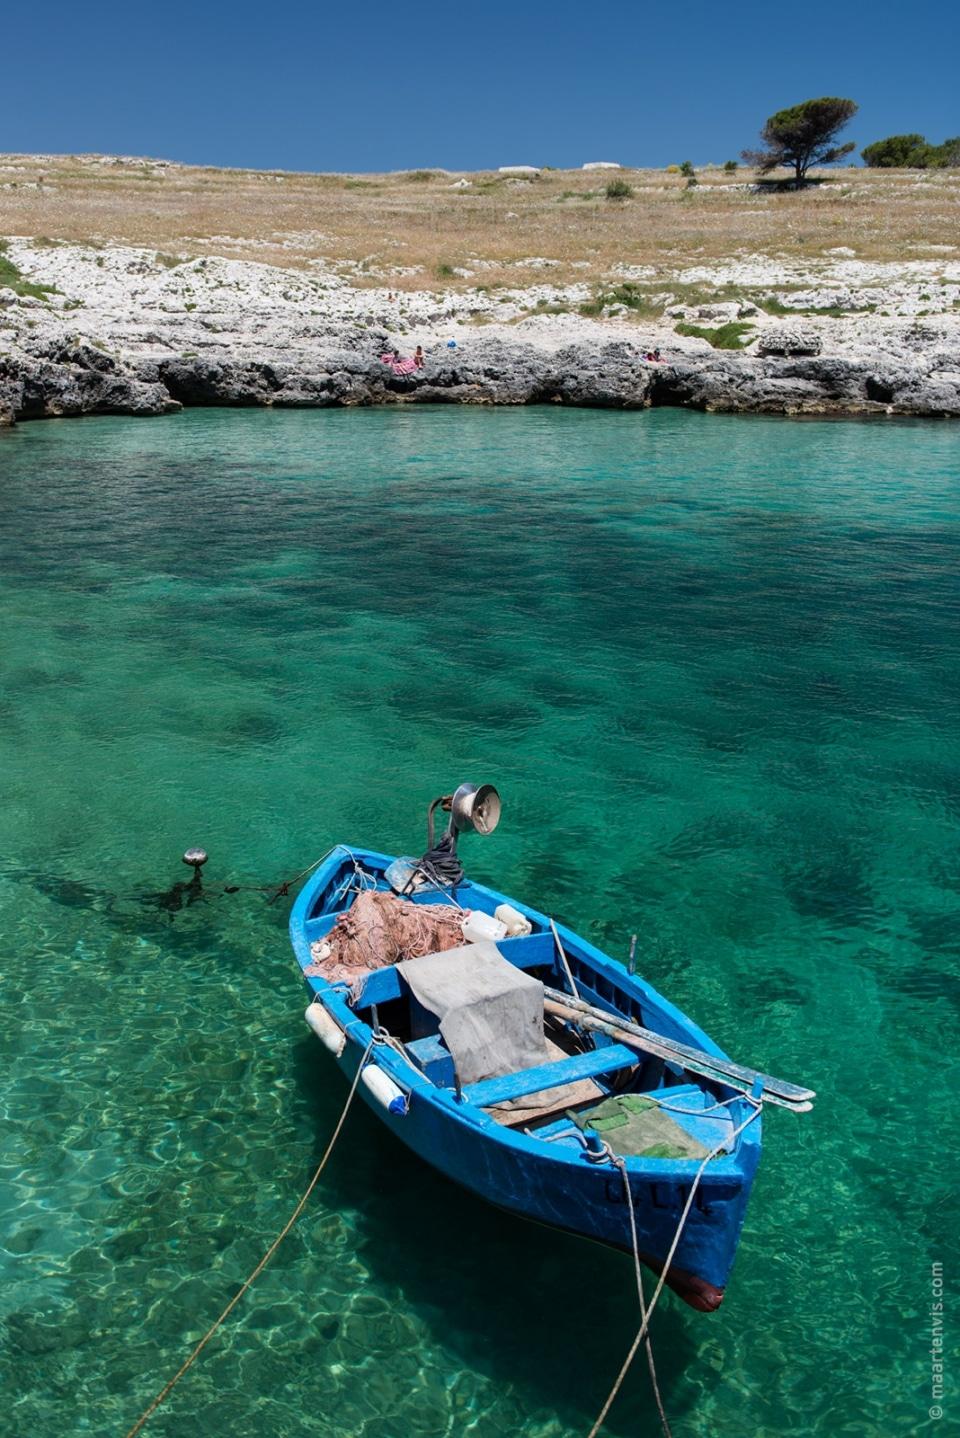 20140526 0621 960x1438 - Puglia Coastal Drive